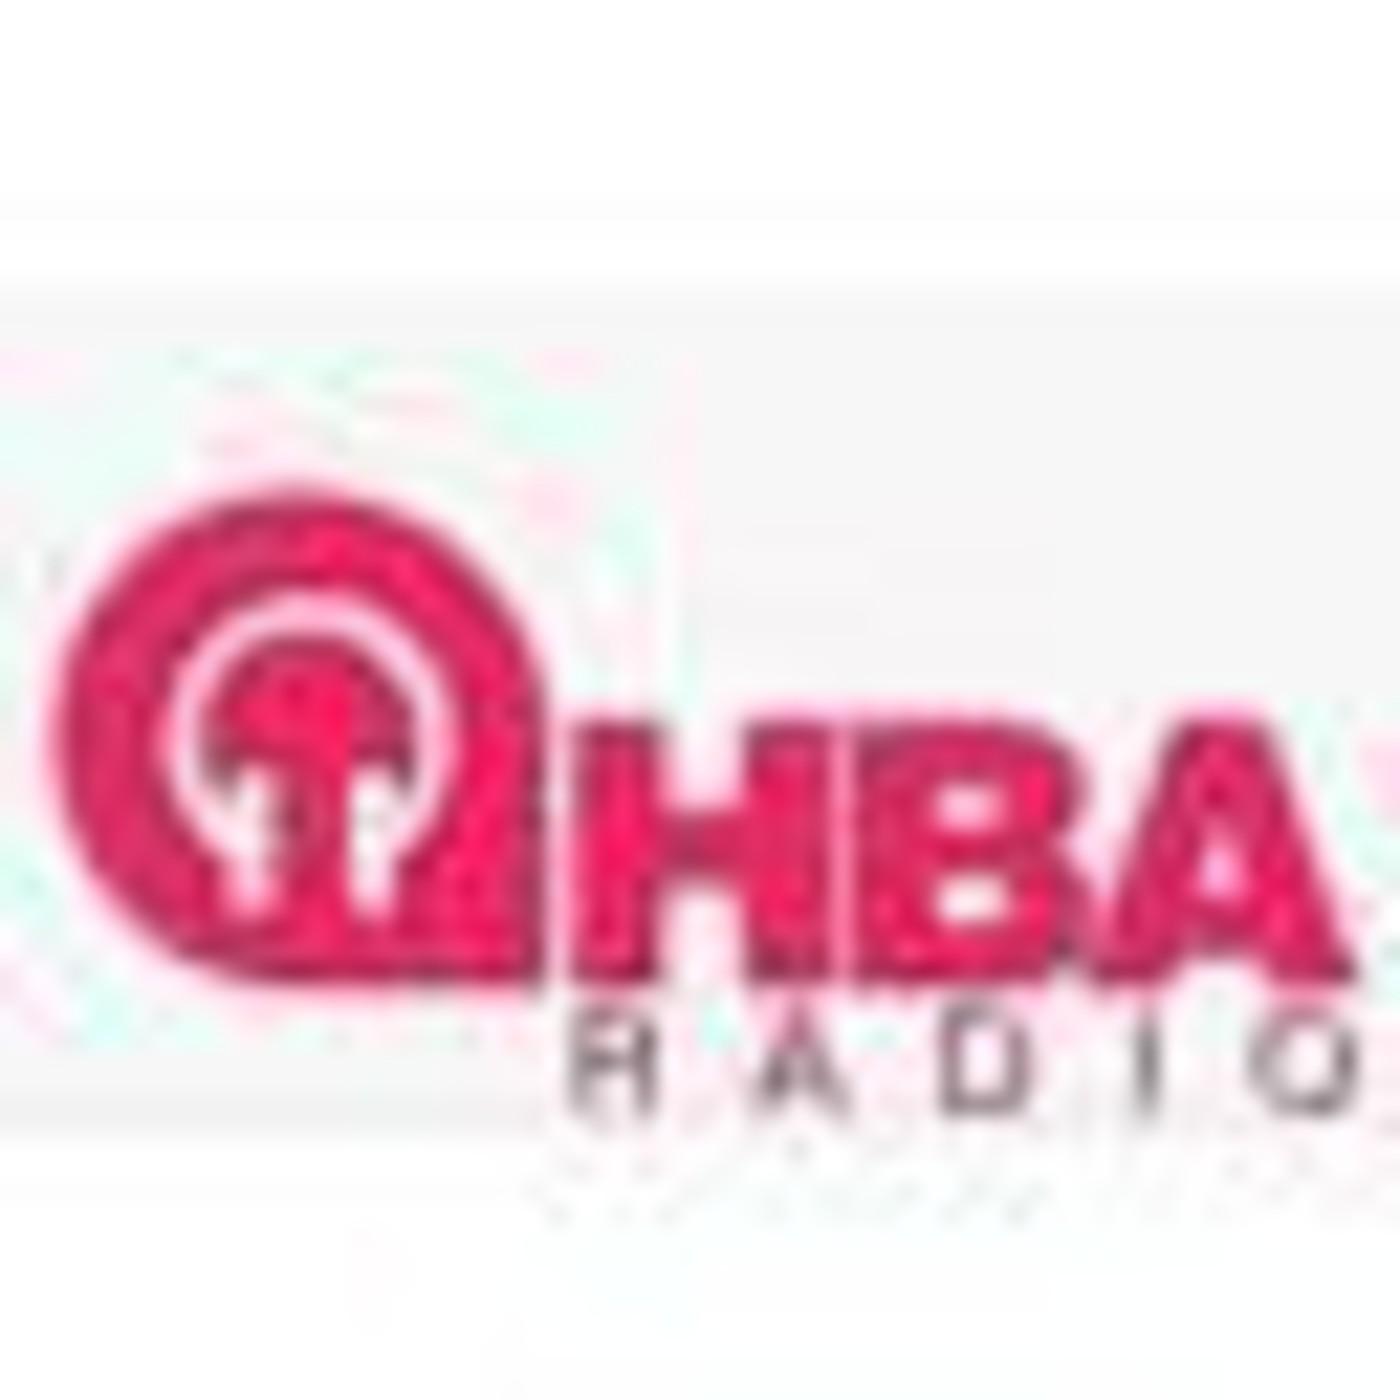 HBA - HOUSE BUENOS AIRES